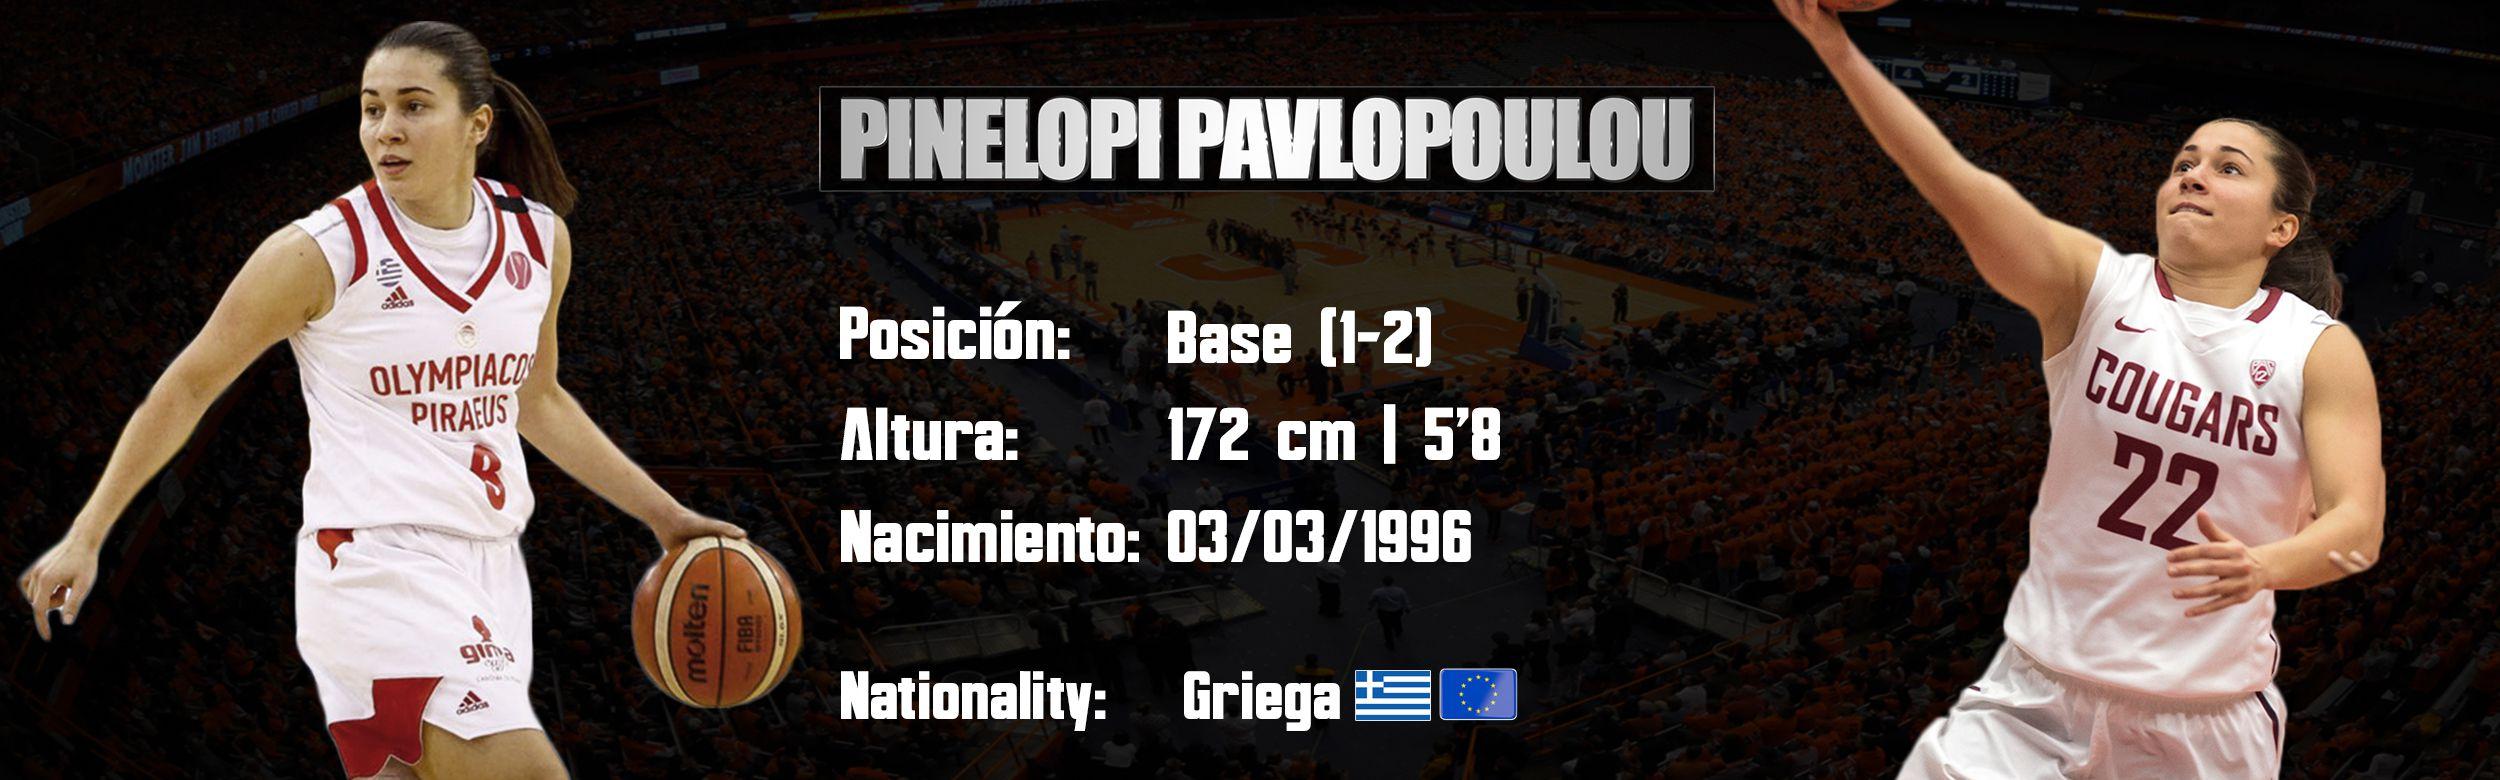 Pinelopi Pavlopoulou